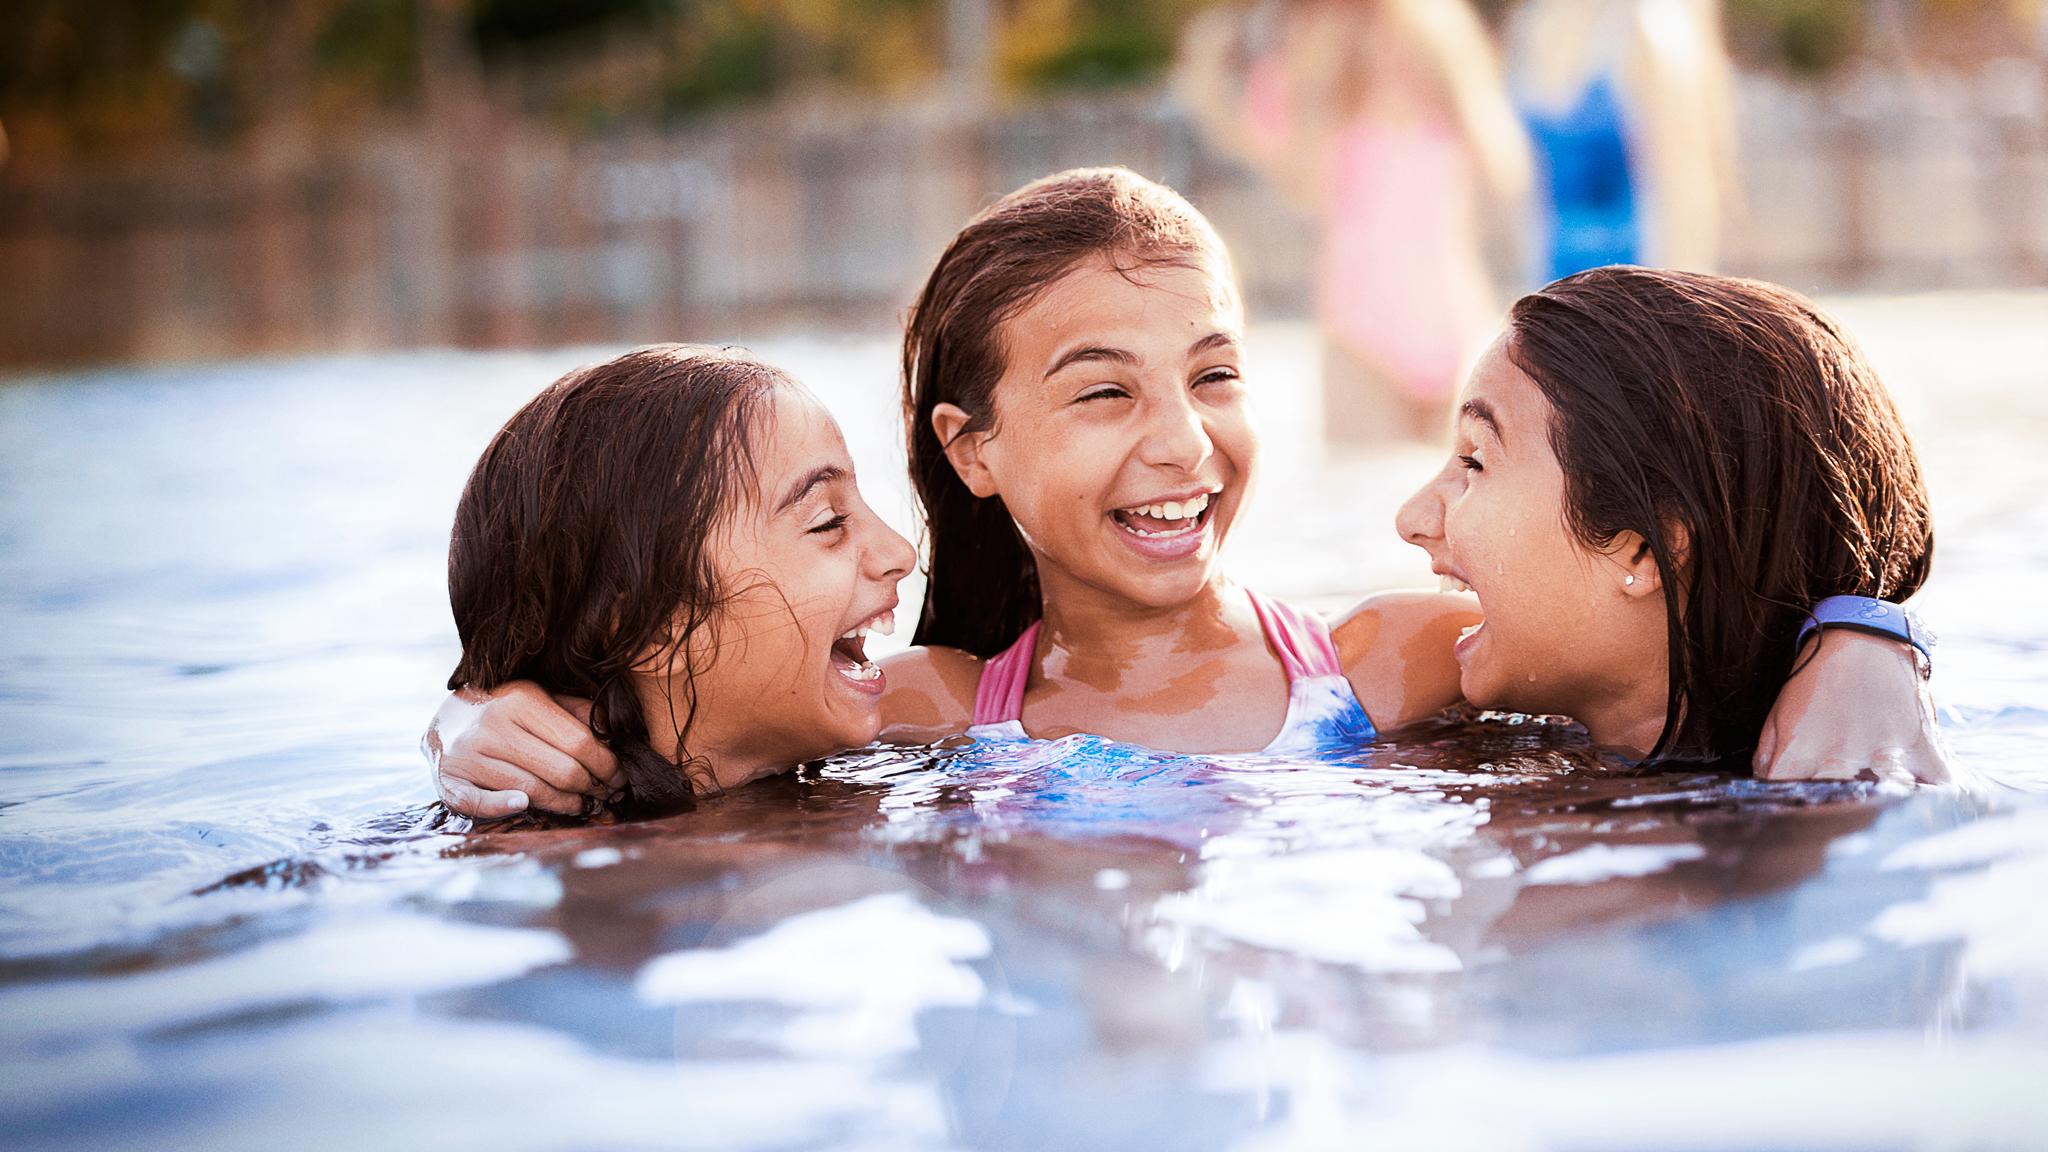 Three tween girls hang out in a pool at their Walt Disney World Resort hotel